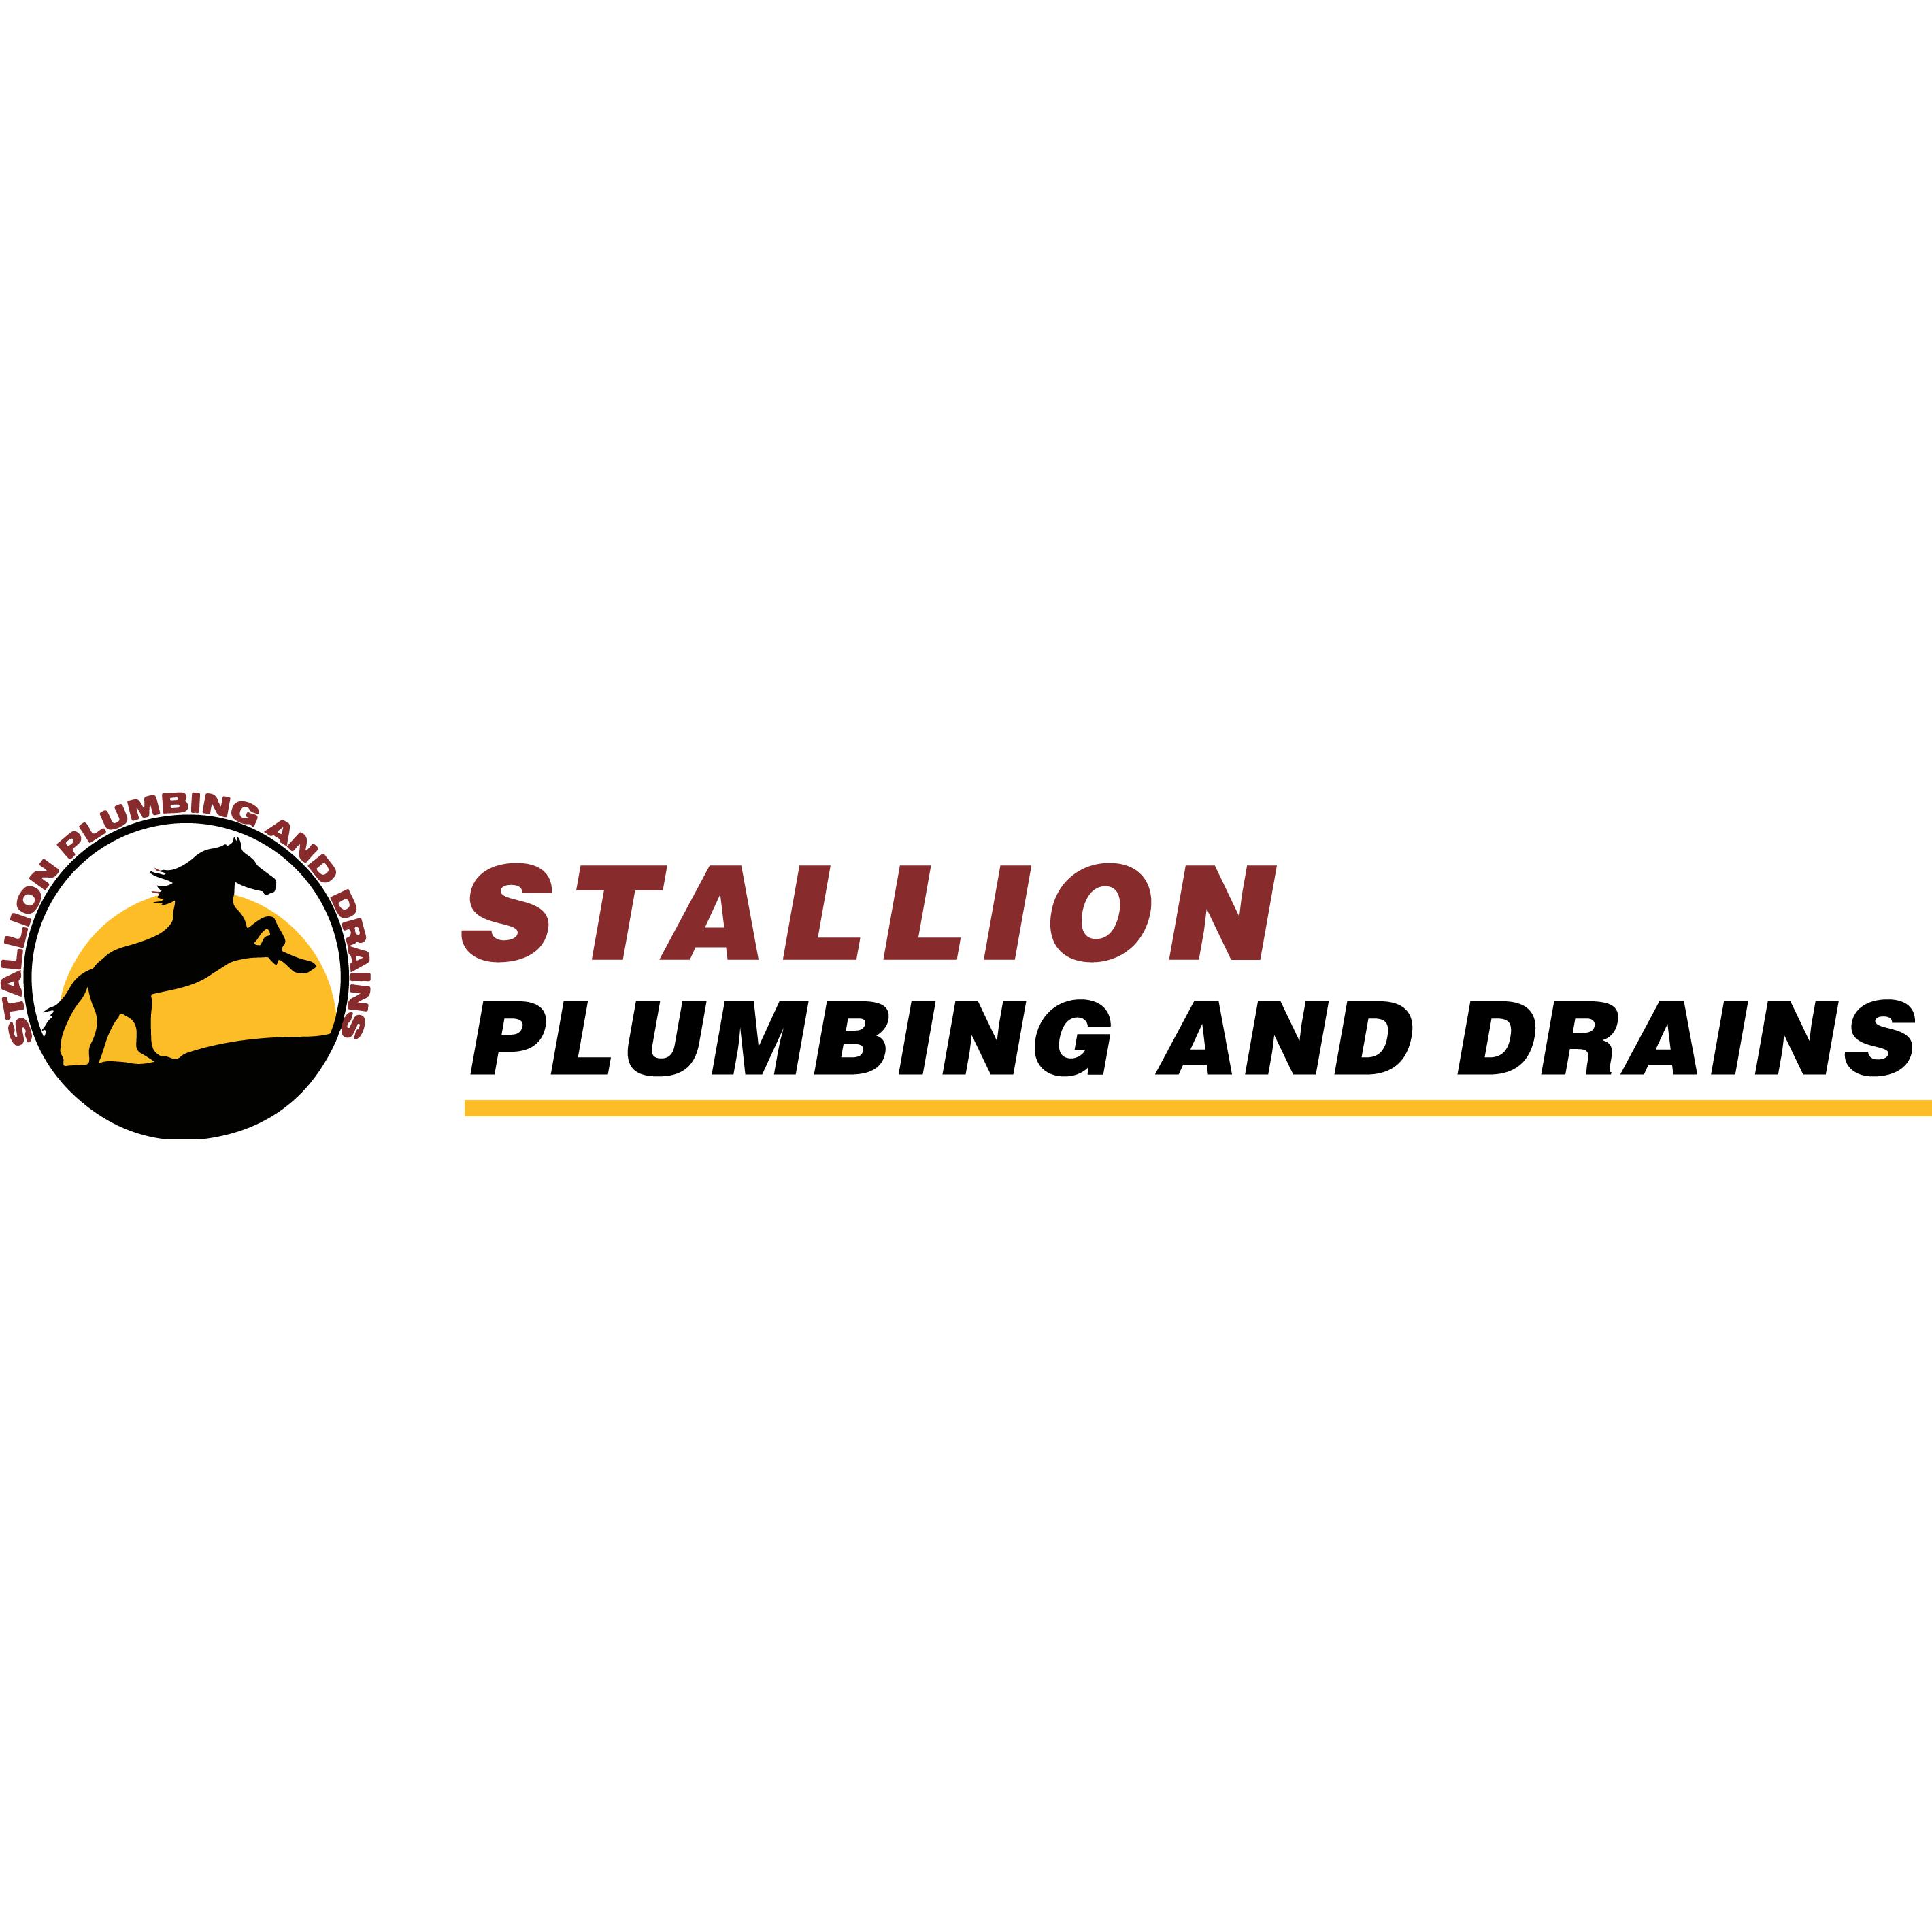 Stallion Plumbing and Drains - Salt Lake City, UT - Plumbers & Sewer Repair